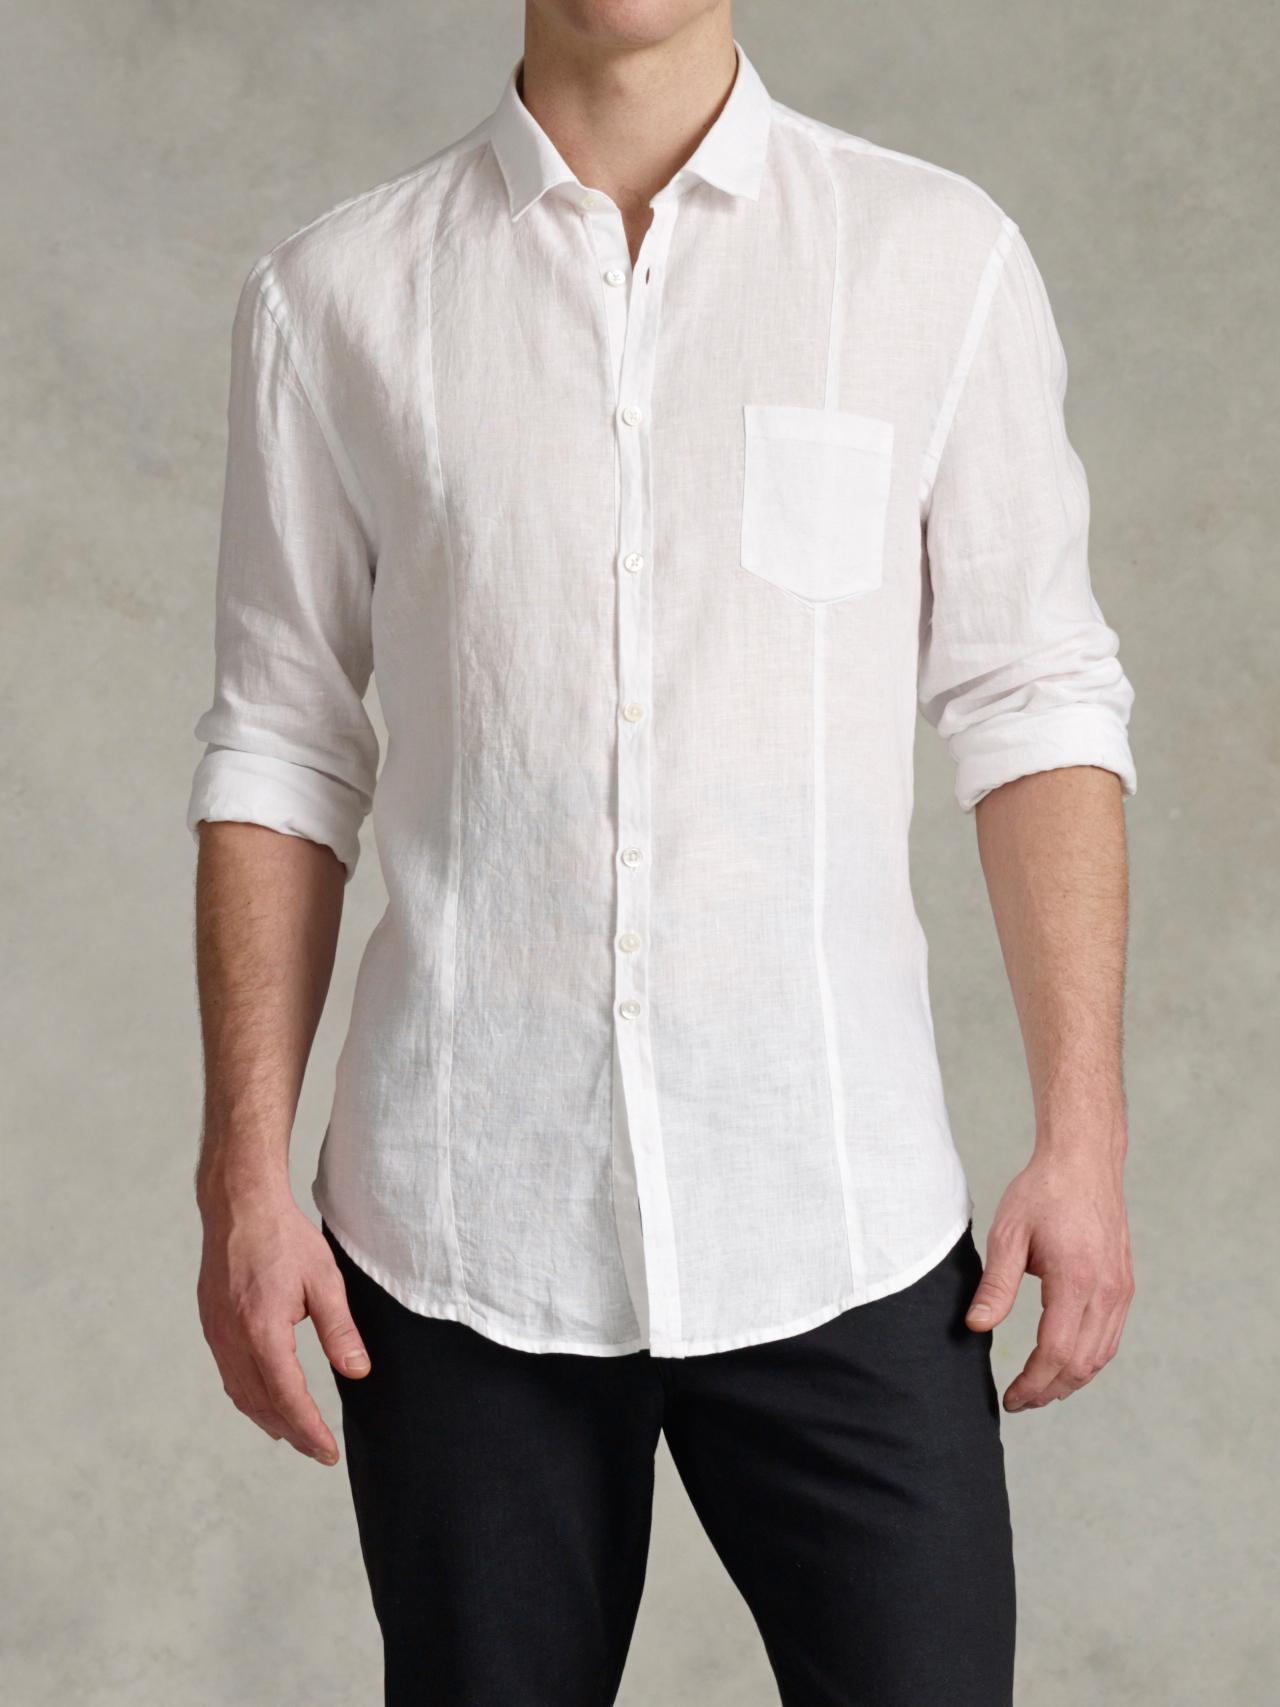 902a3aef58ea Slim Fit Mens White Linen Shirt - BCD Tofu House